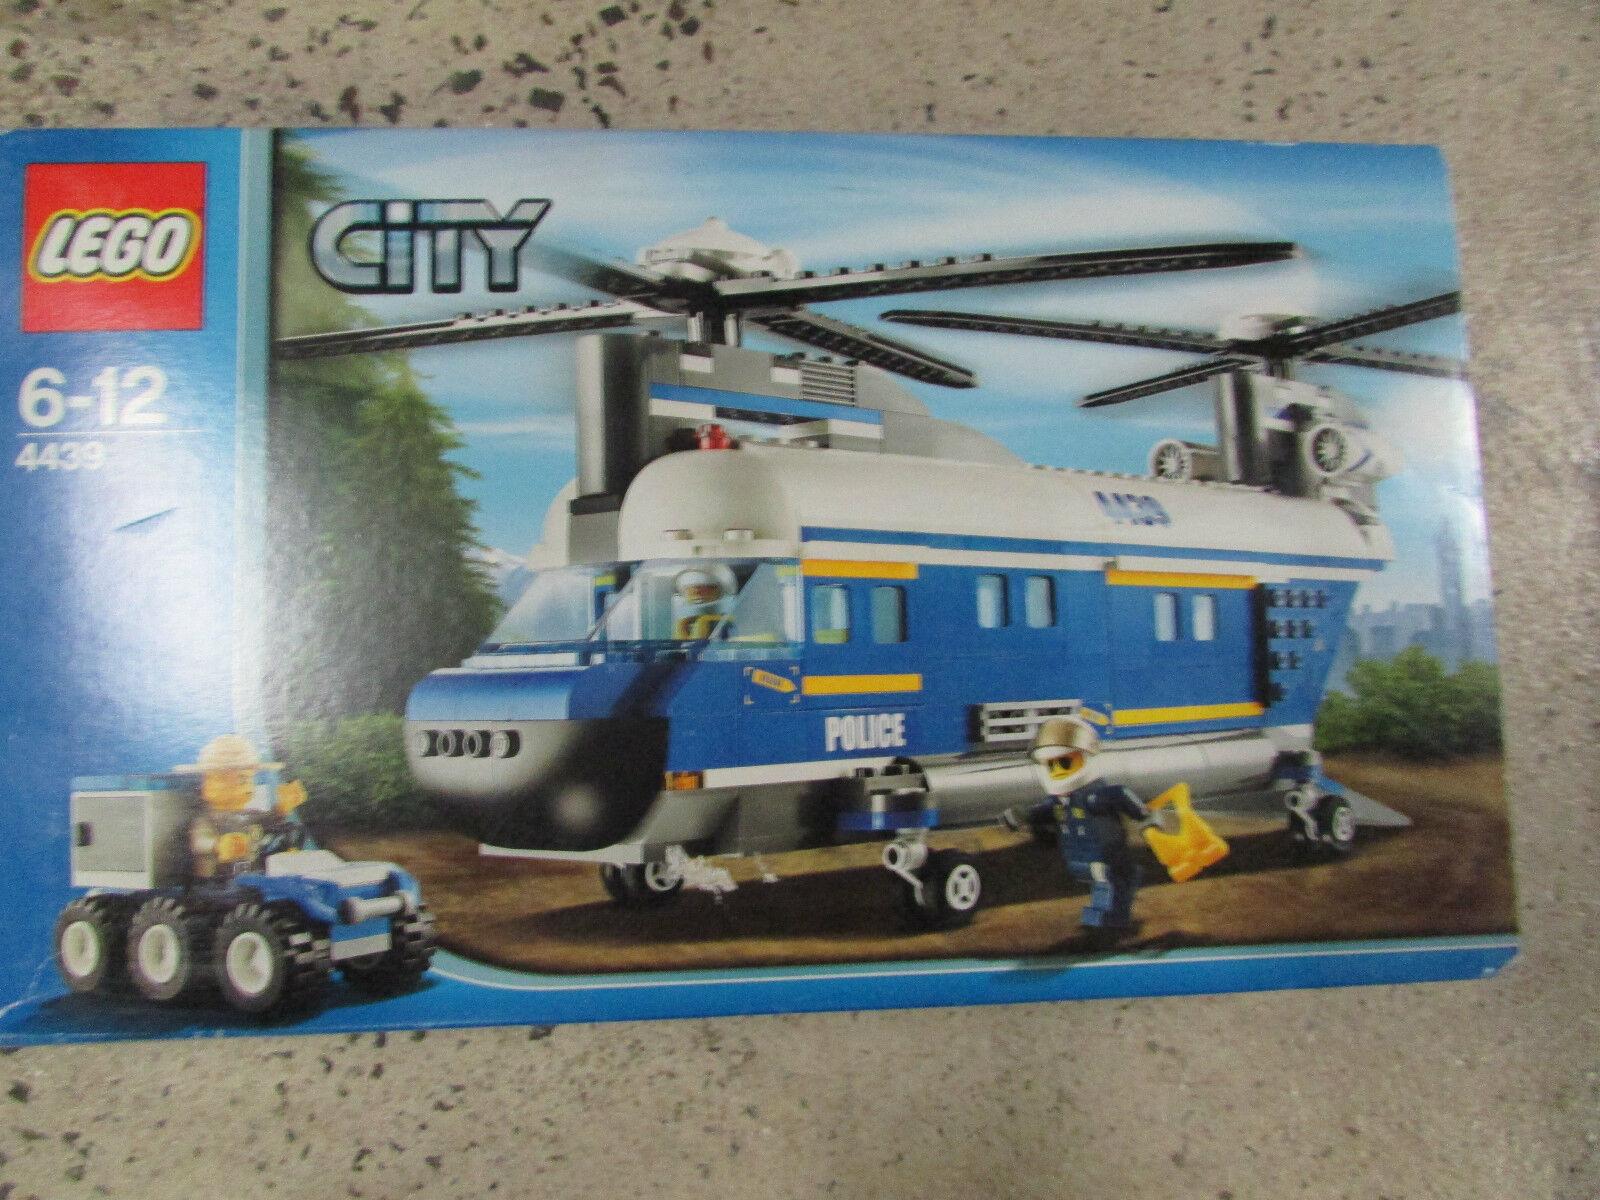 BOXED SET LEGO  CITY 4439  réductions incroyables